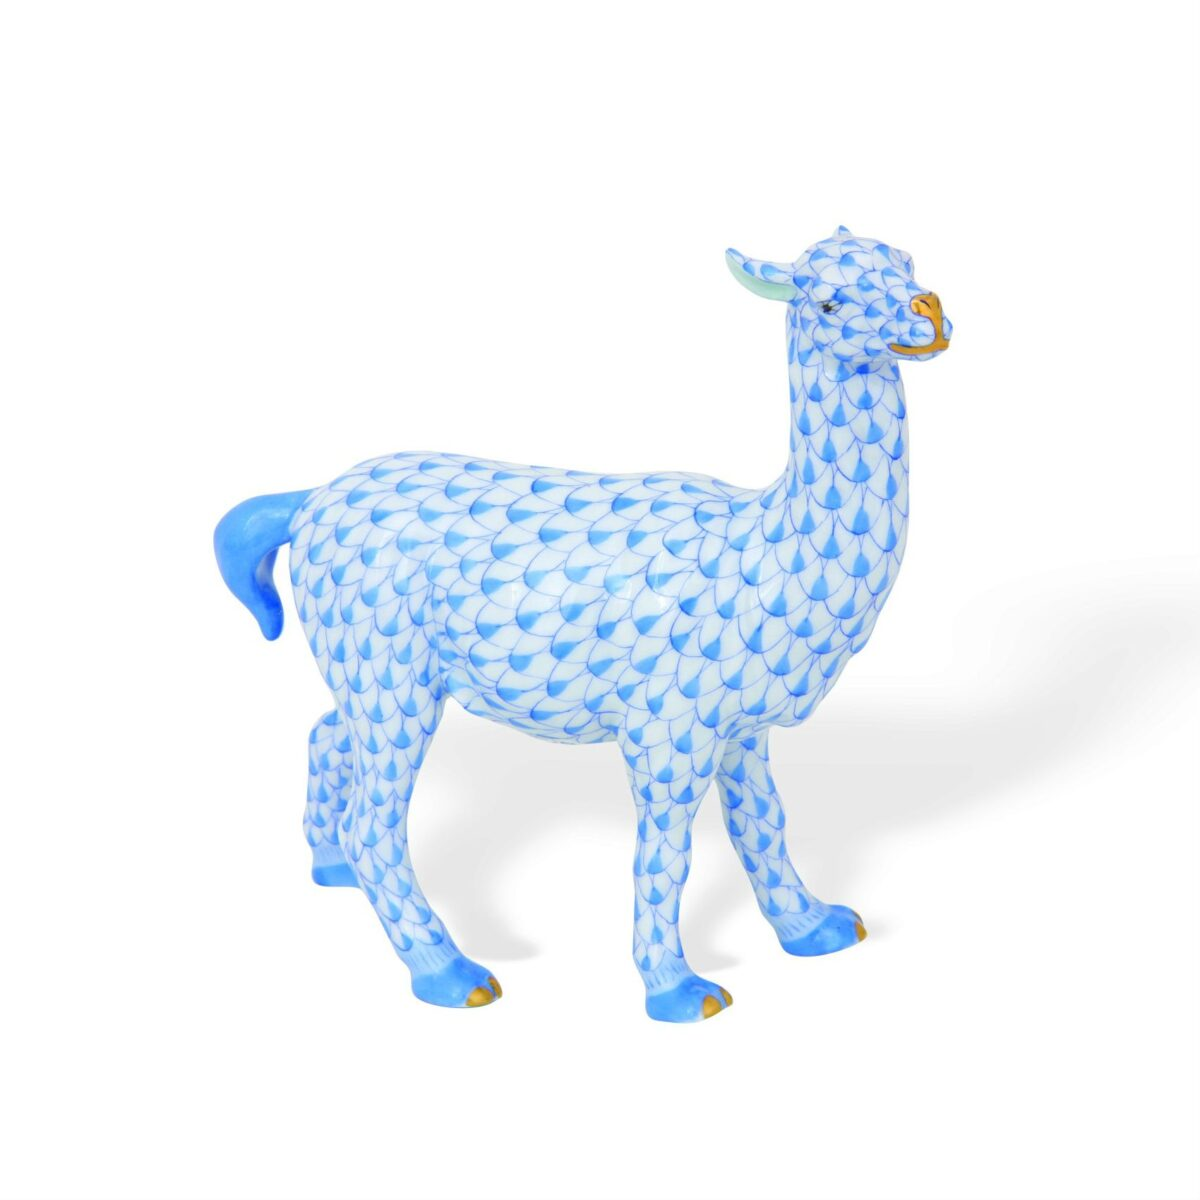 Llama - Fishnet Blue